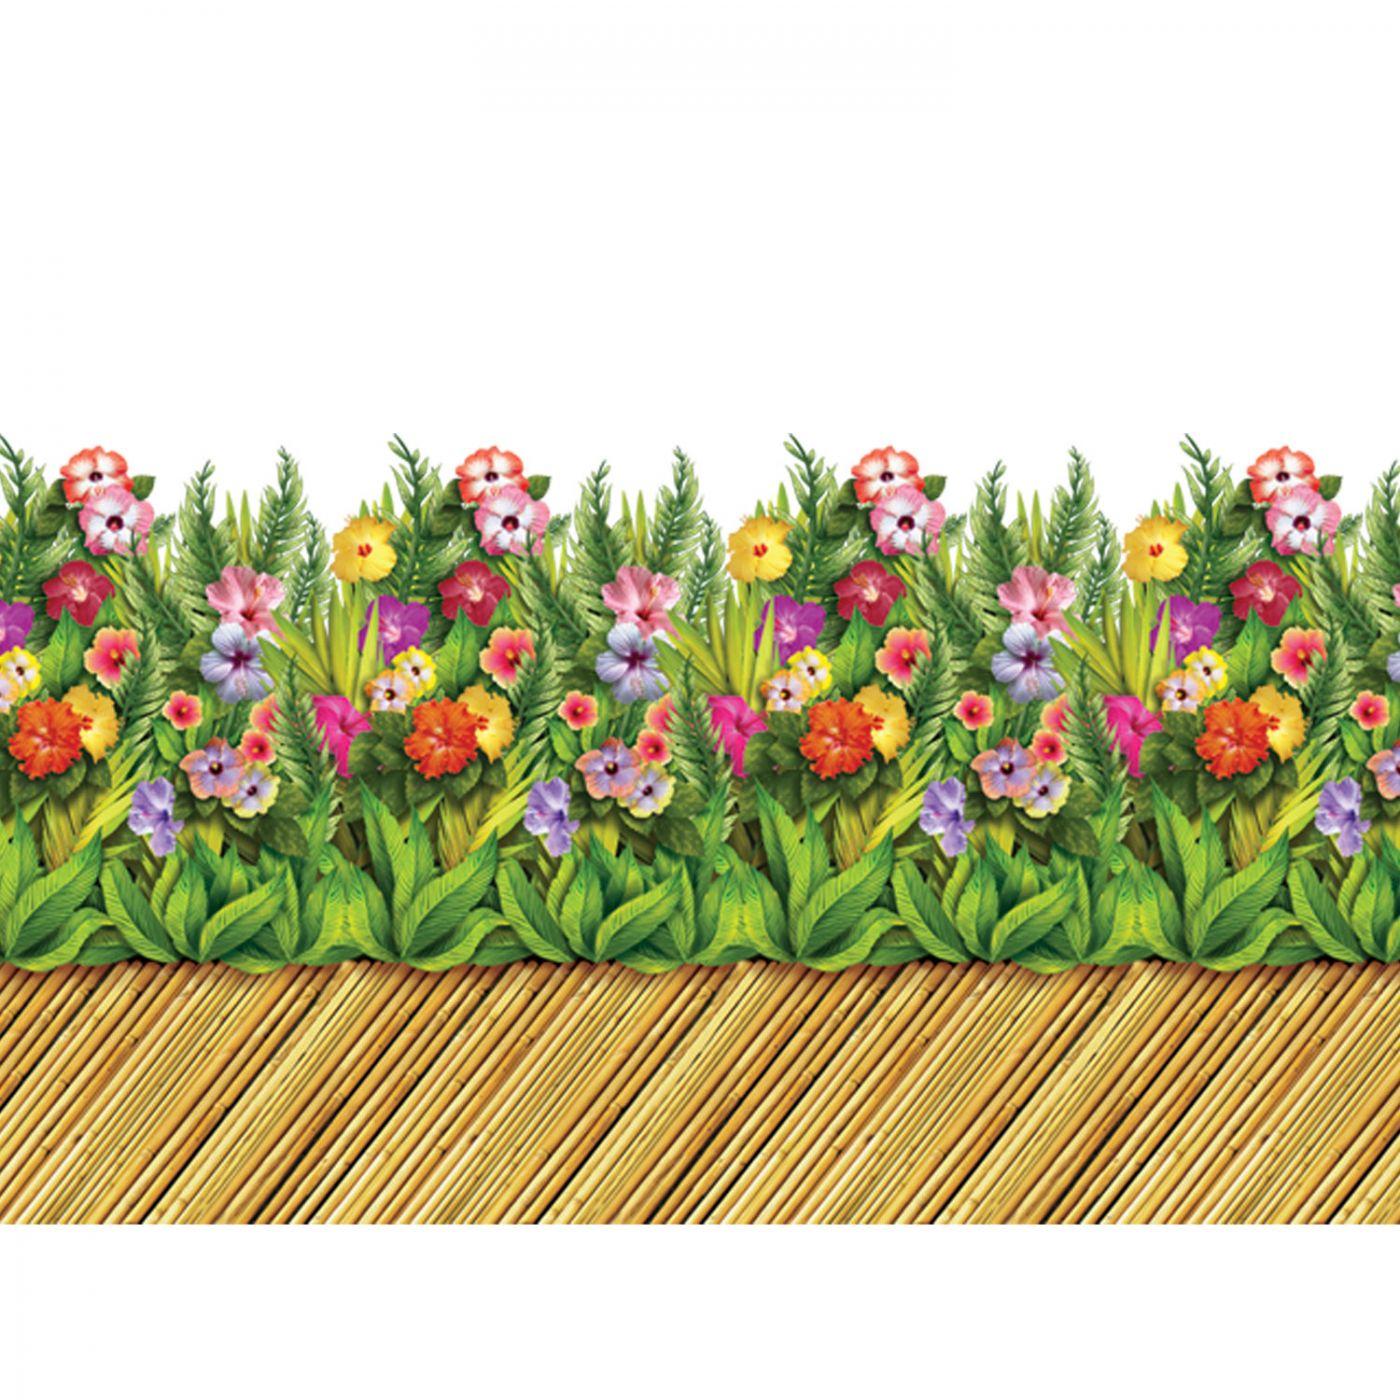 Tropical Flower & Bamboo Walkway Border (6) image